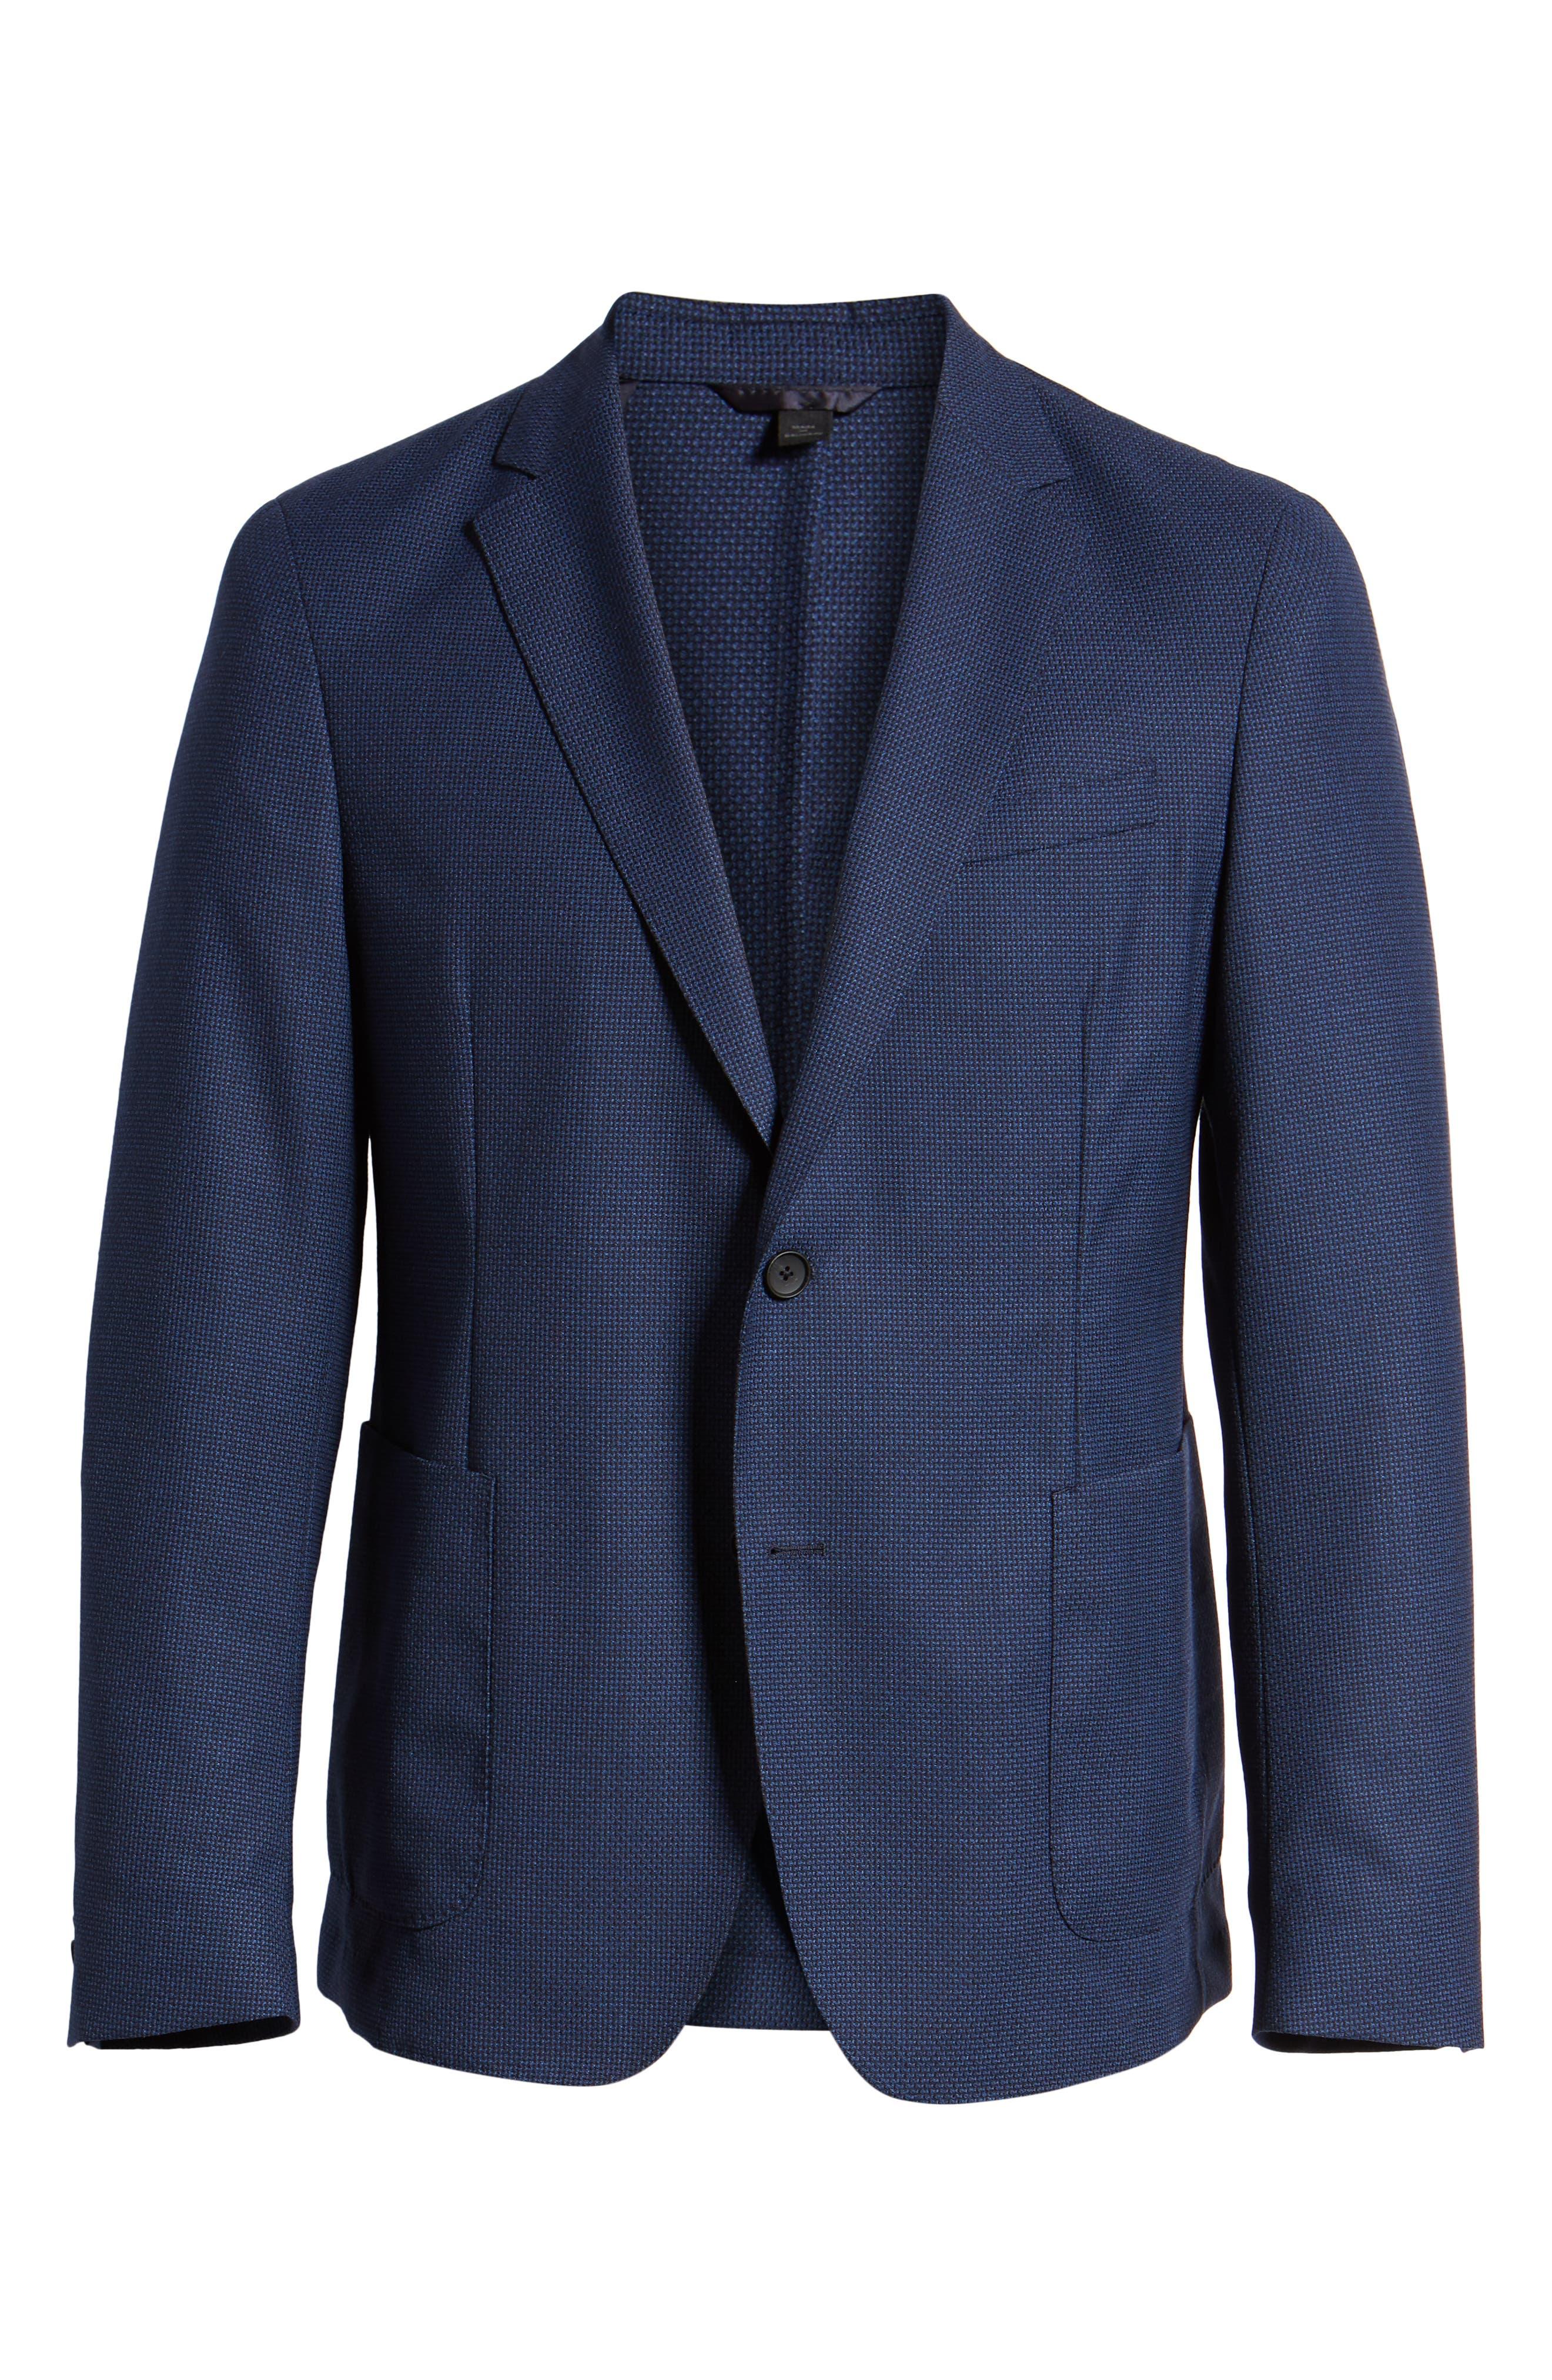 BOSS, Nold Slim Fit Wool Blazer, Alternate thumbnail 5, color, BLUE